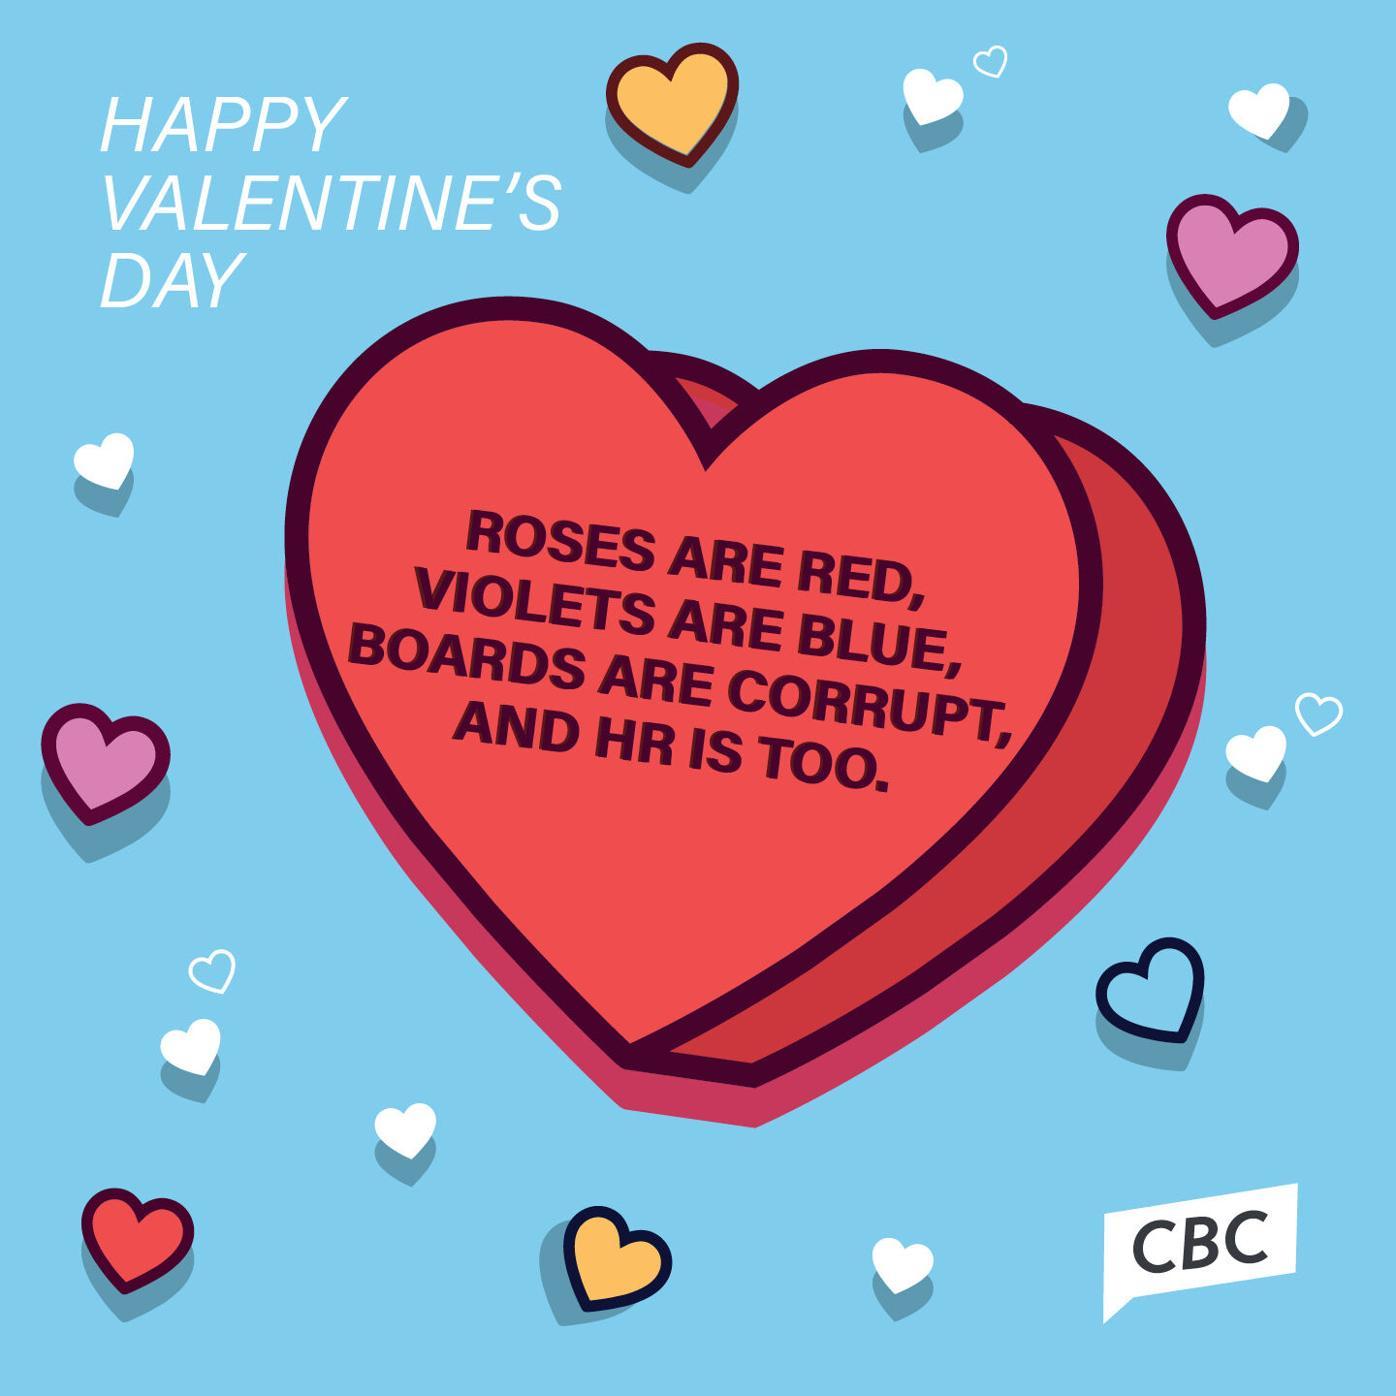 CBC_IG_ValentinesDay2.jpg